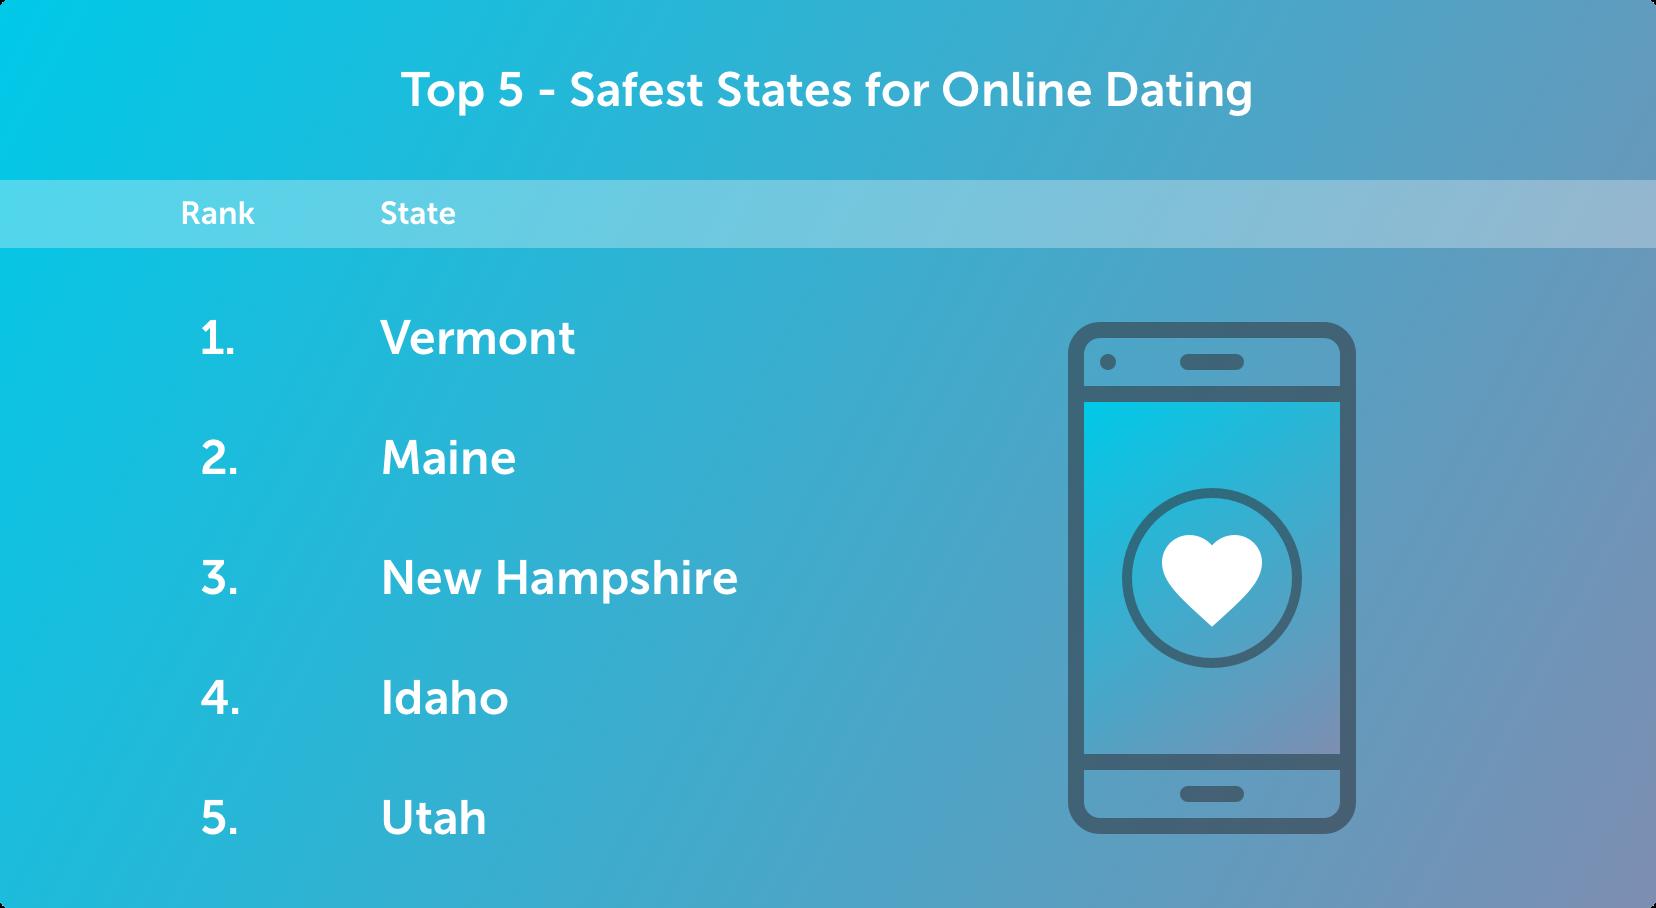 Rank-Safest States for Online Dating